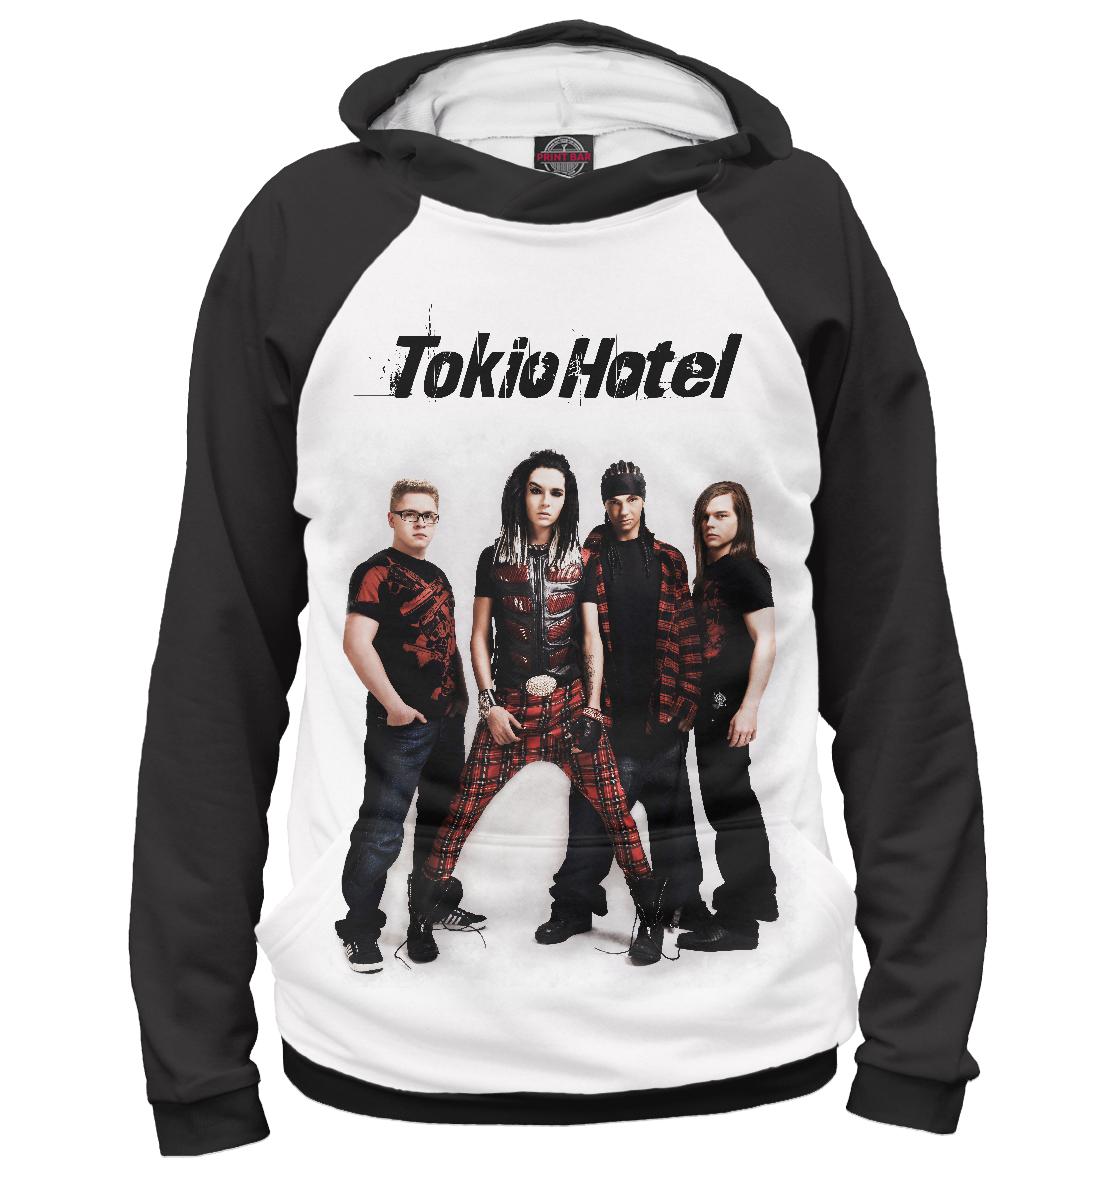 Купить Tokio Hotel, Printbar, Худи, THT-912478-hud-1